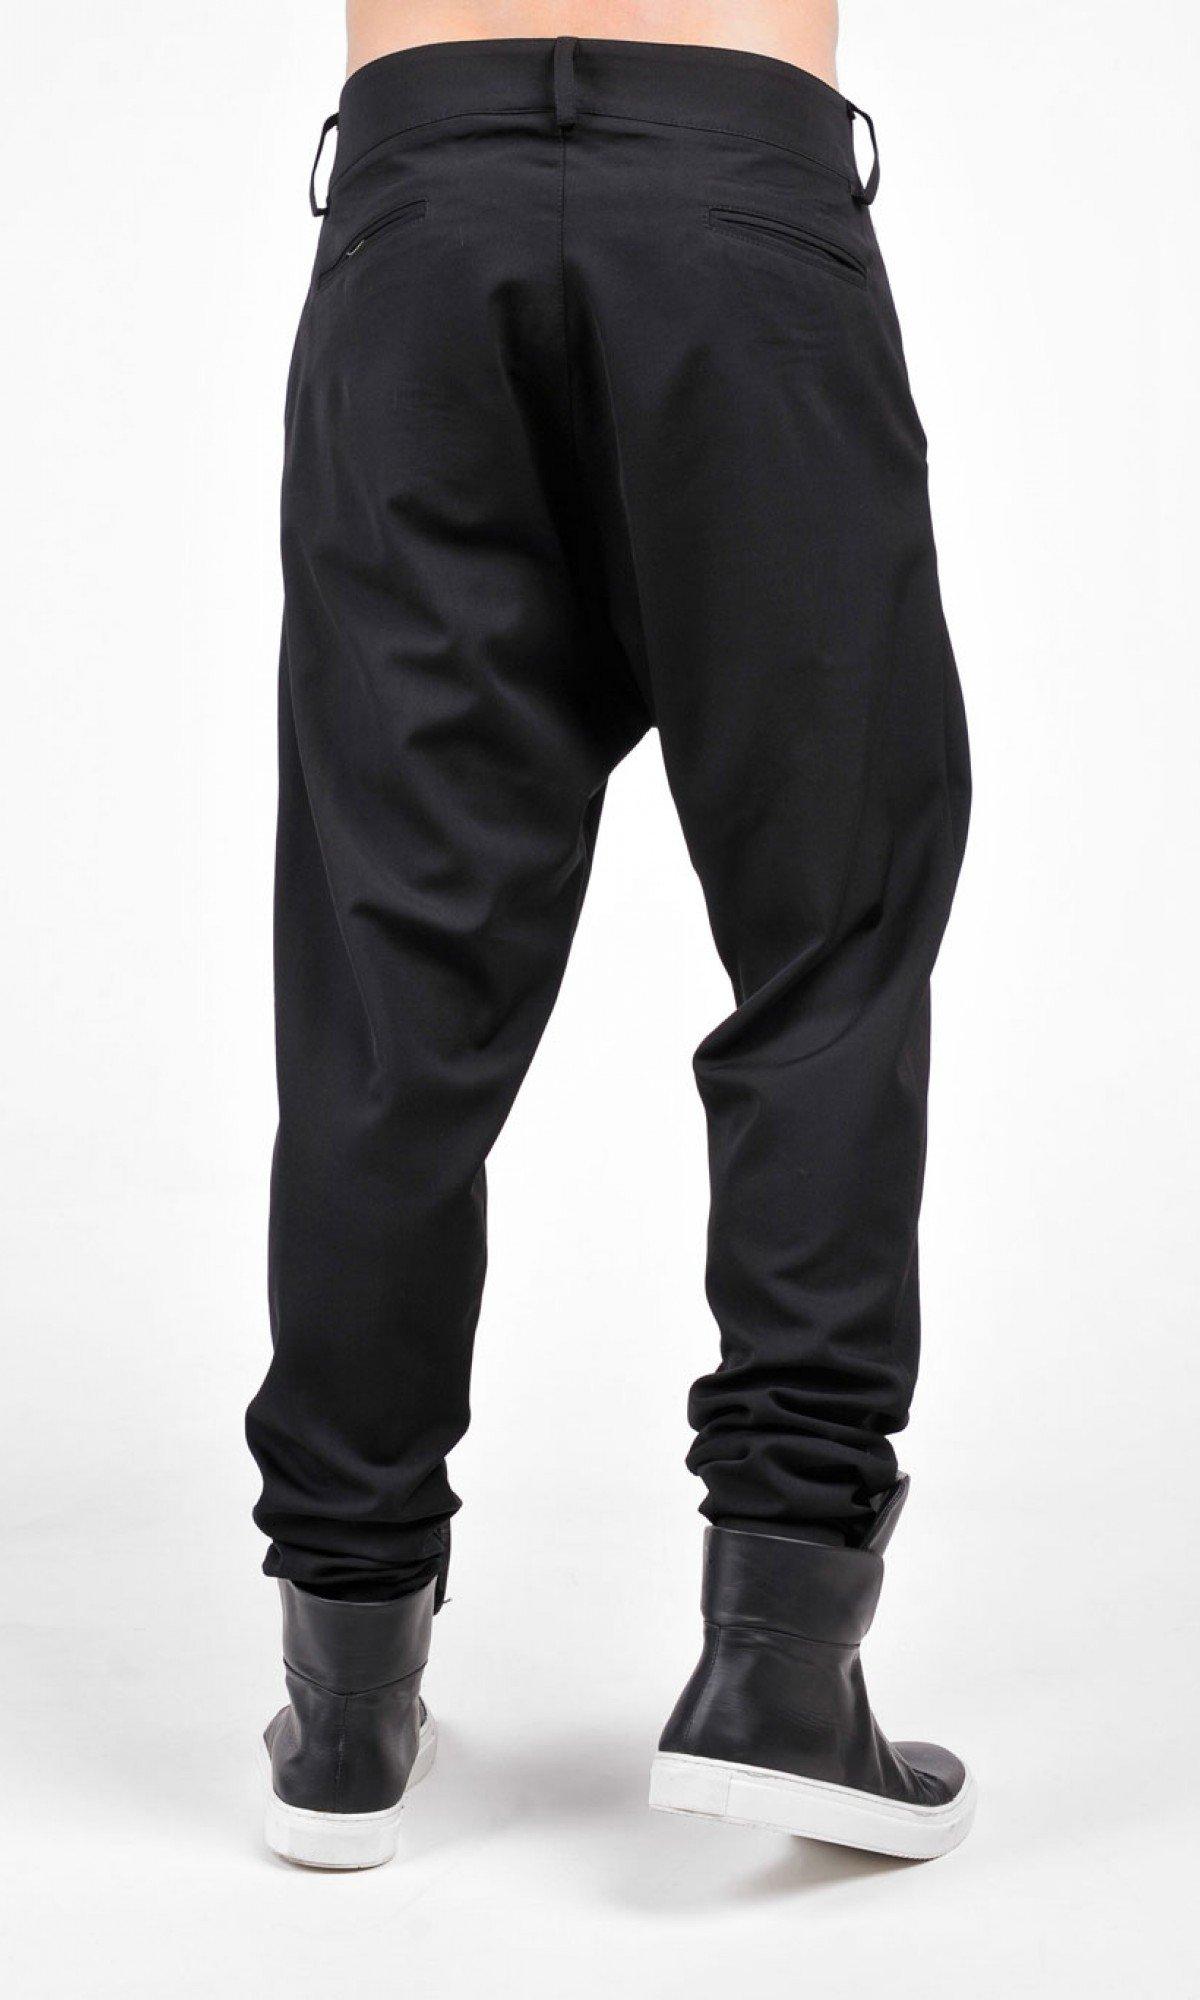 Cold Wool Black Loose Drop Crotch Pants A05581M